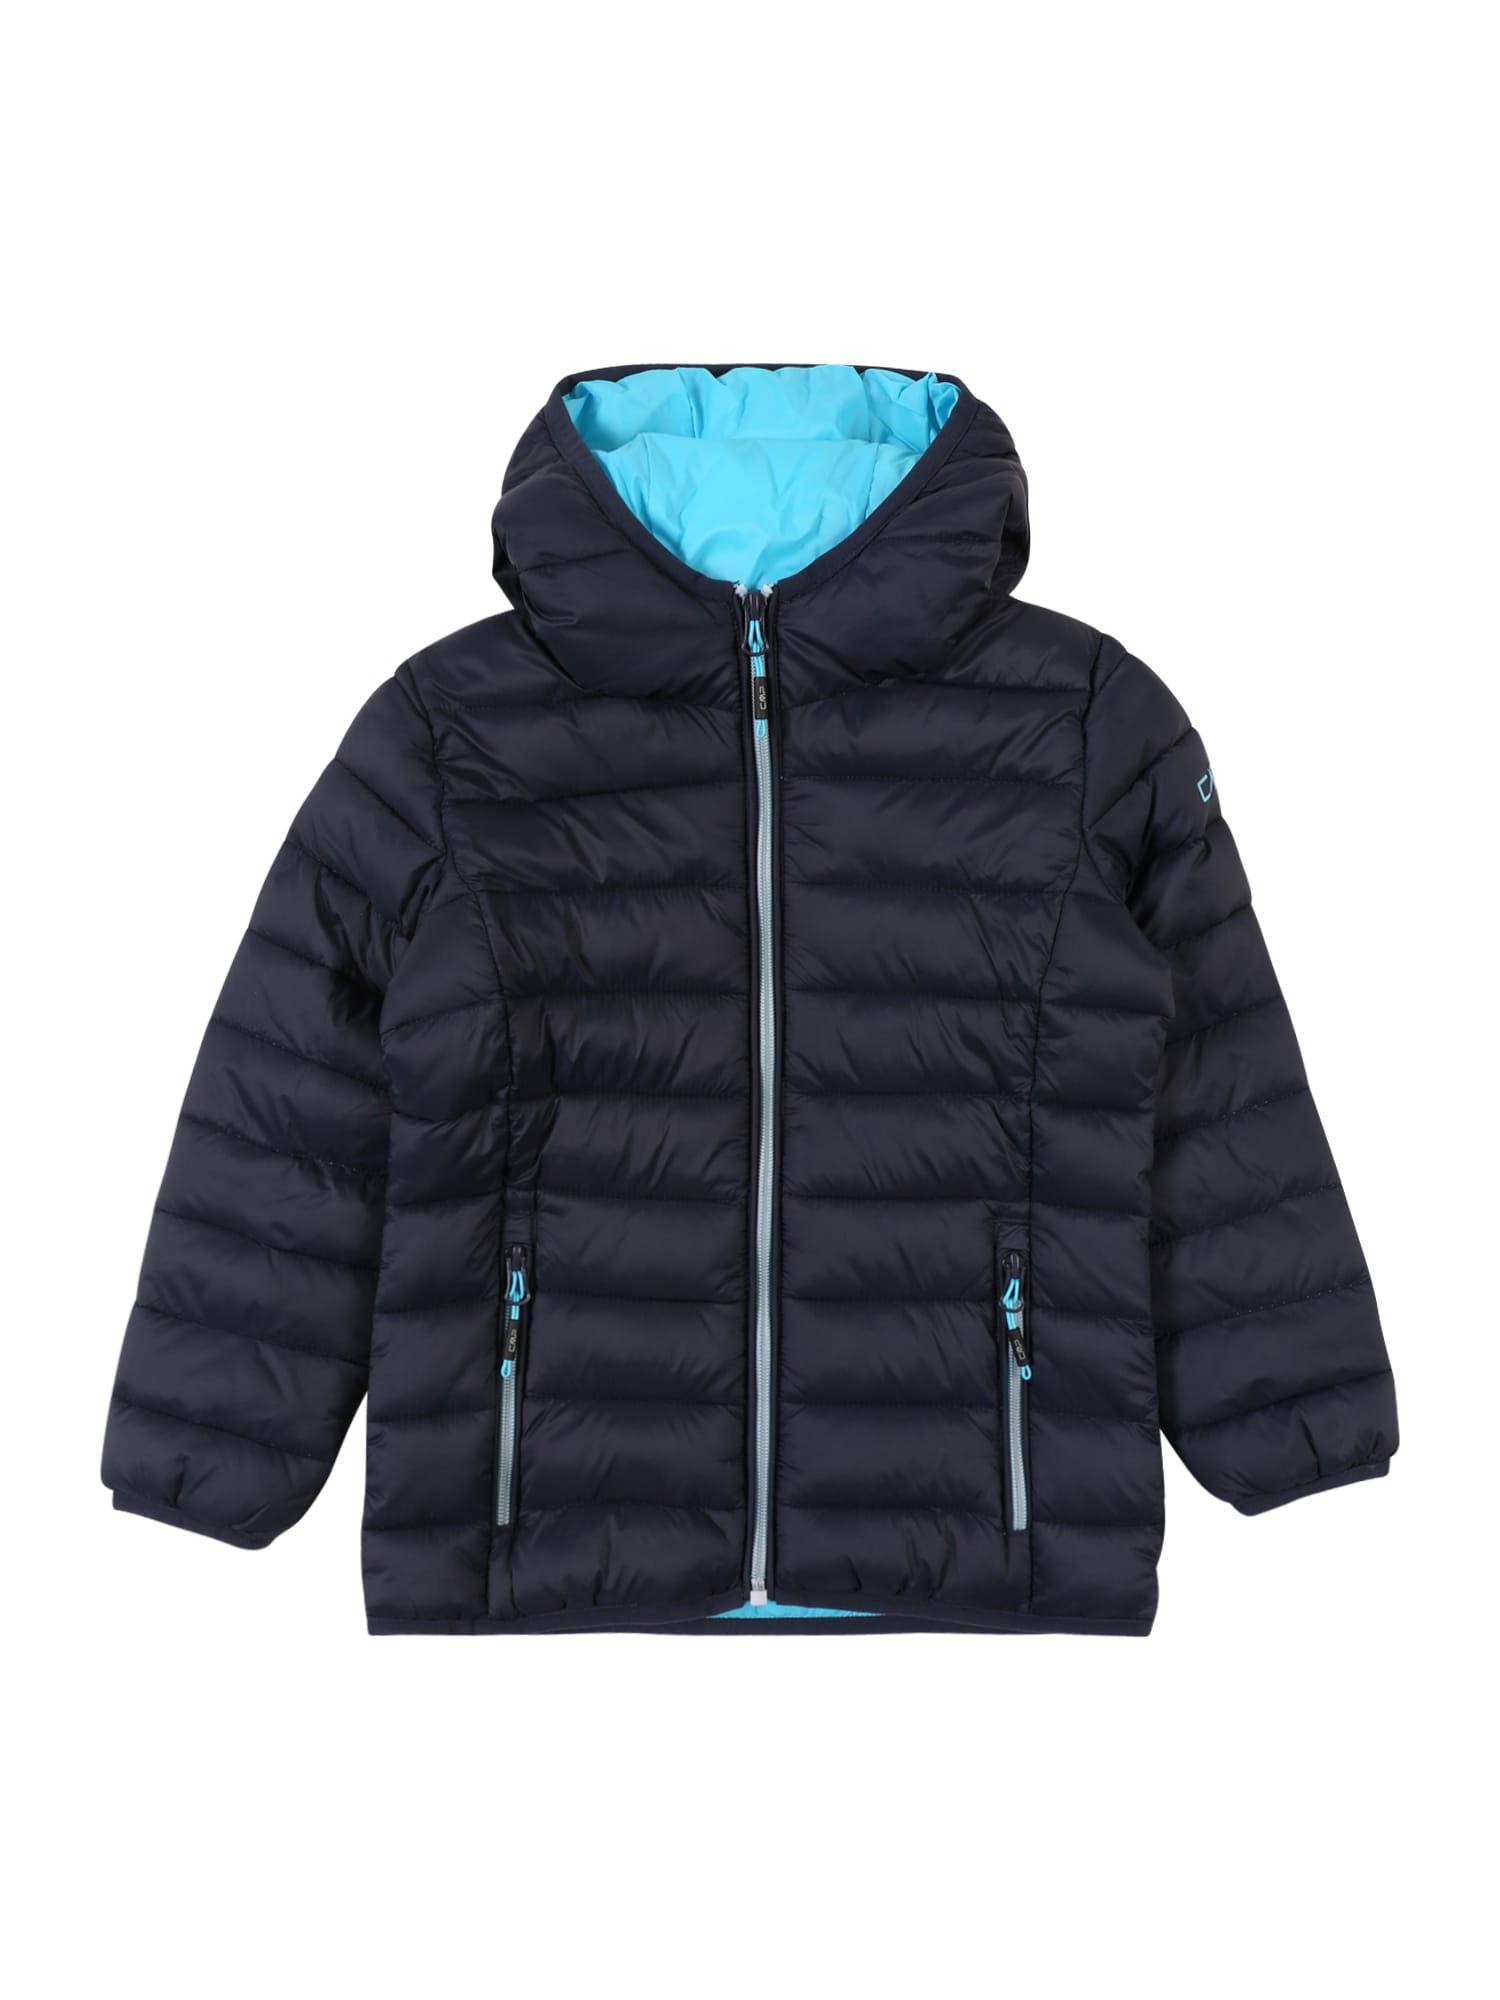 CMP Laisvalaikio striukė 'GIRL JACKET FIX HOOD' turkio spalva / nakties mėlyna